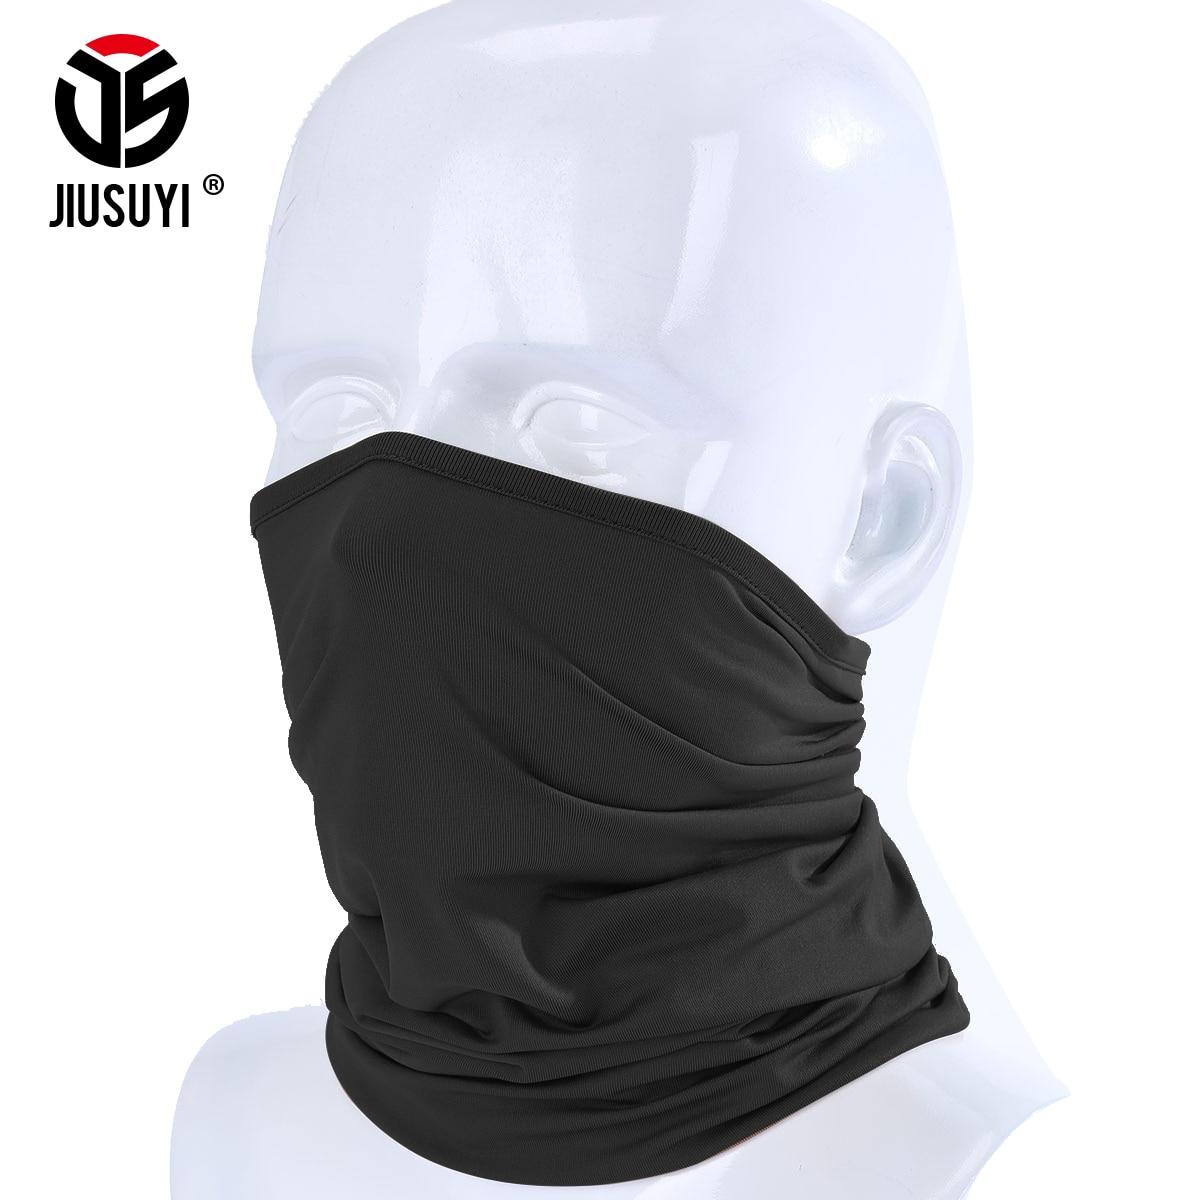 Magic Headband Elastic Breathable Neck Gaiter Warmer Tube Scarf Half Face Mask Bandana Headwear Bicycle Sweatband Pirate Hat Men